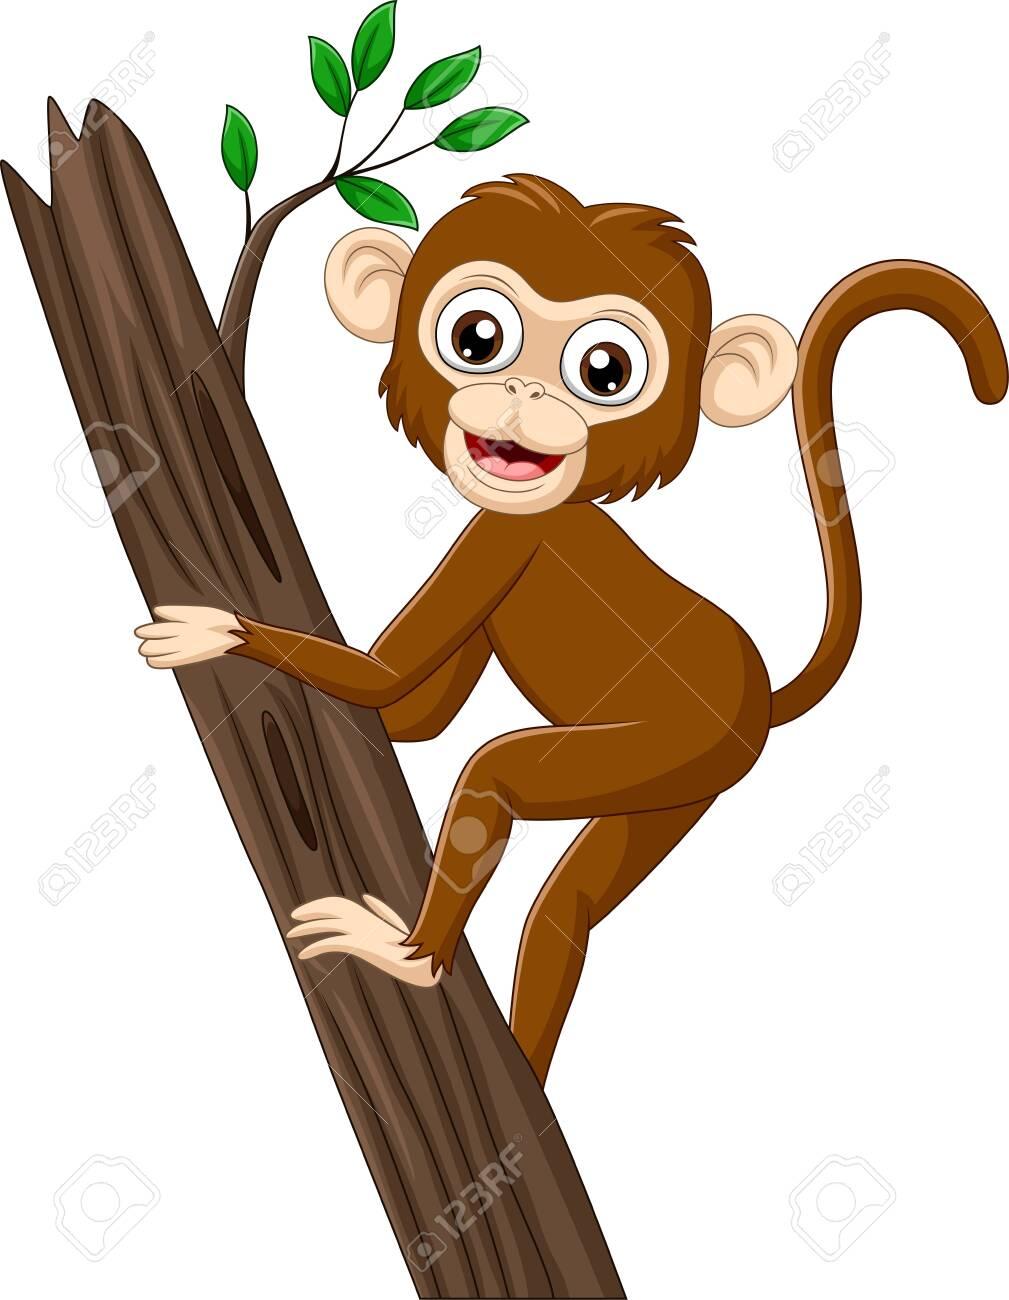 Vector illustration of Cartoon baby monkey climbing tree branch.